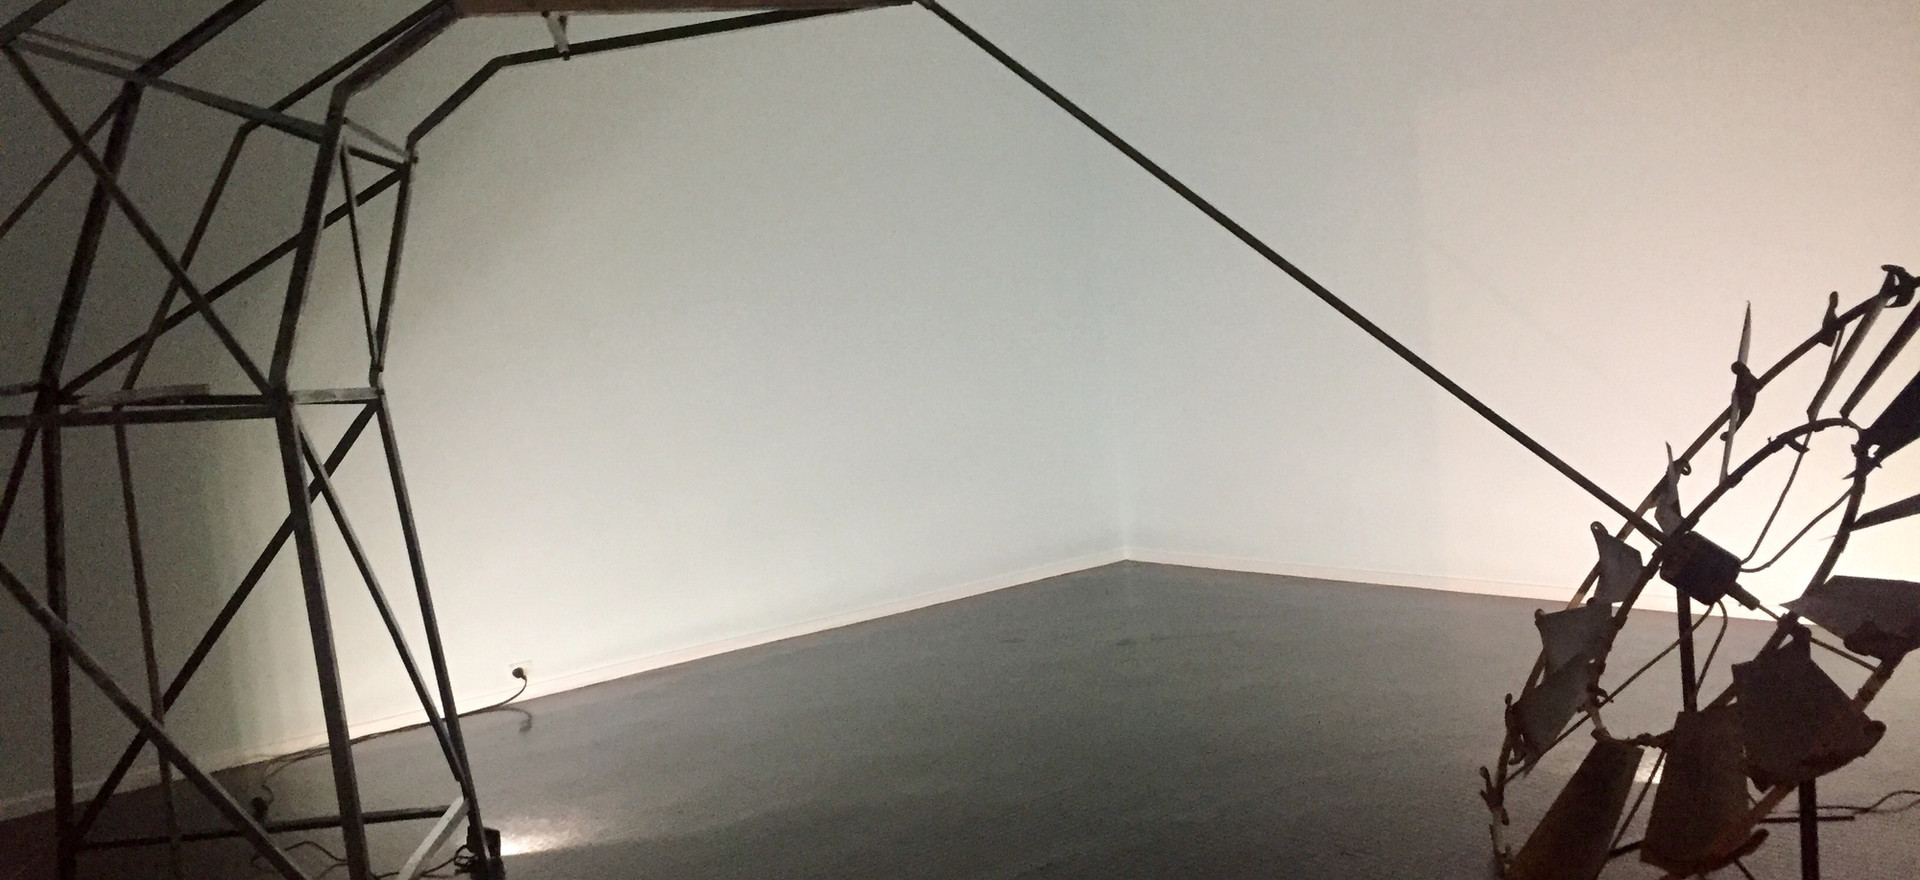 Adaptation  <monument> 2018, @ Warrnambool Art Gallery.